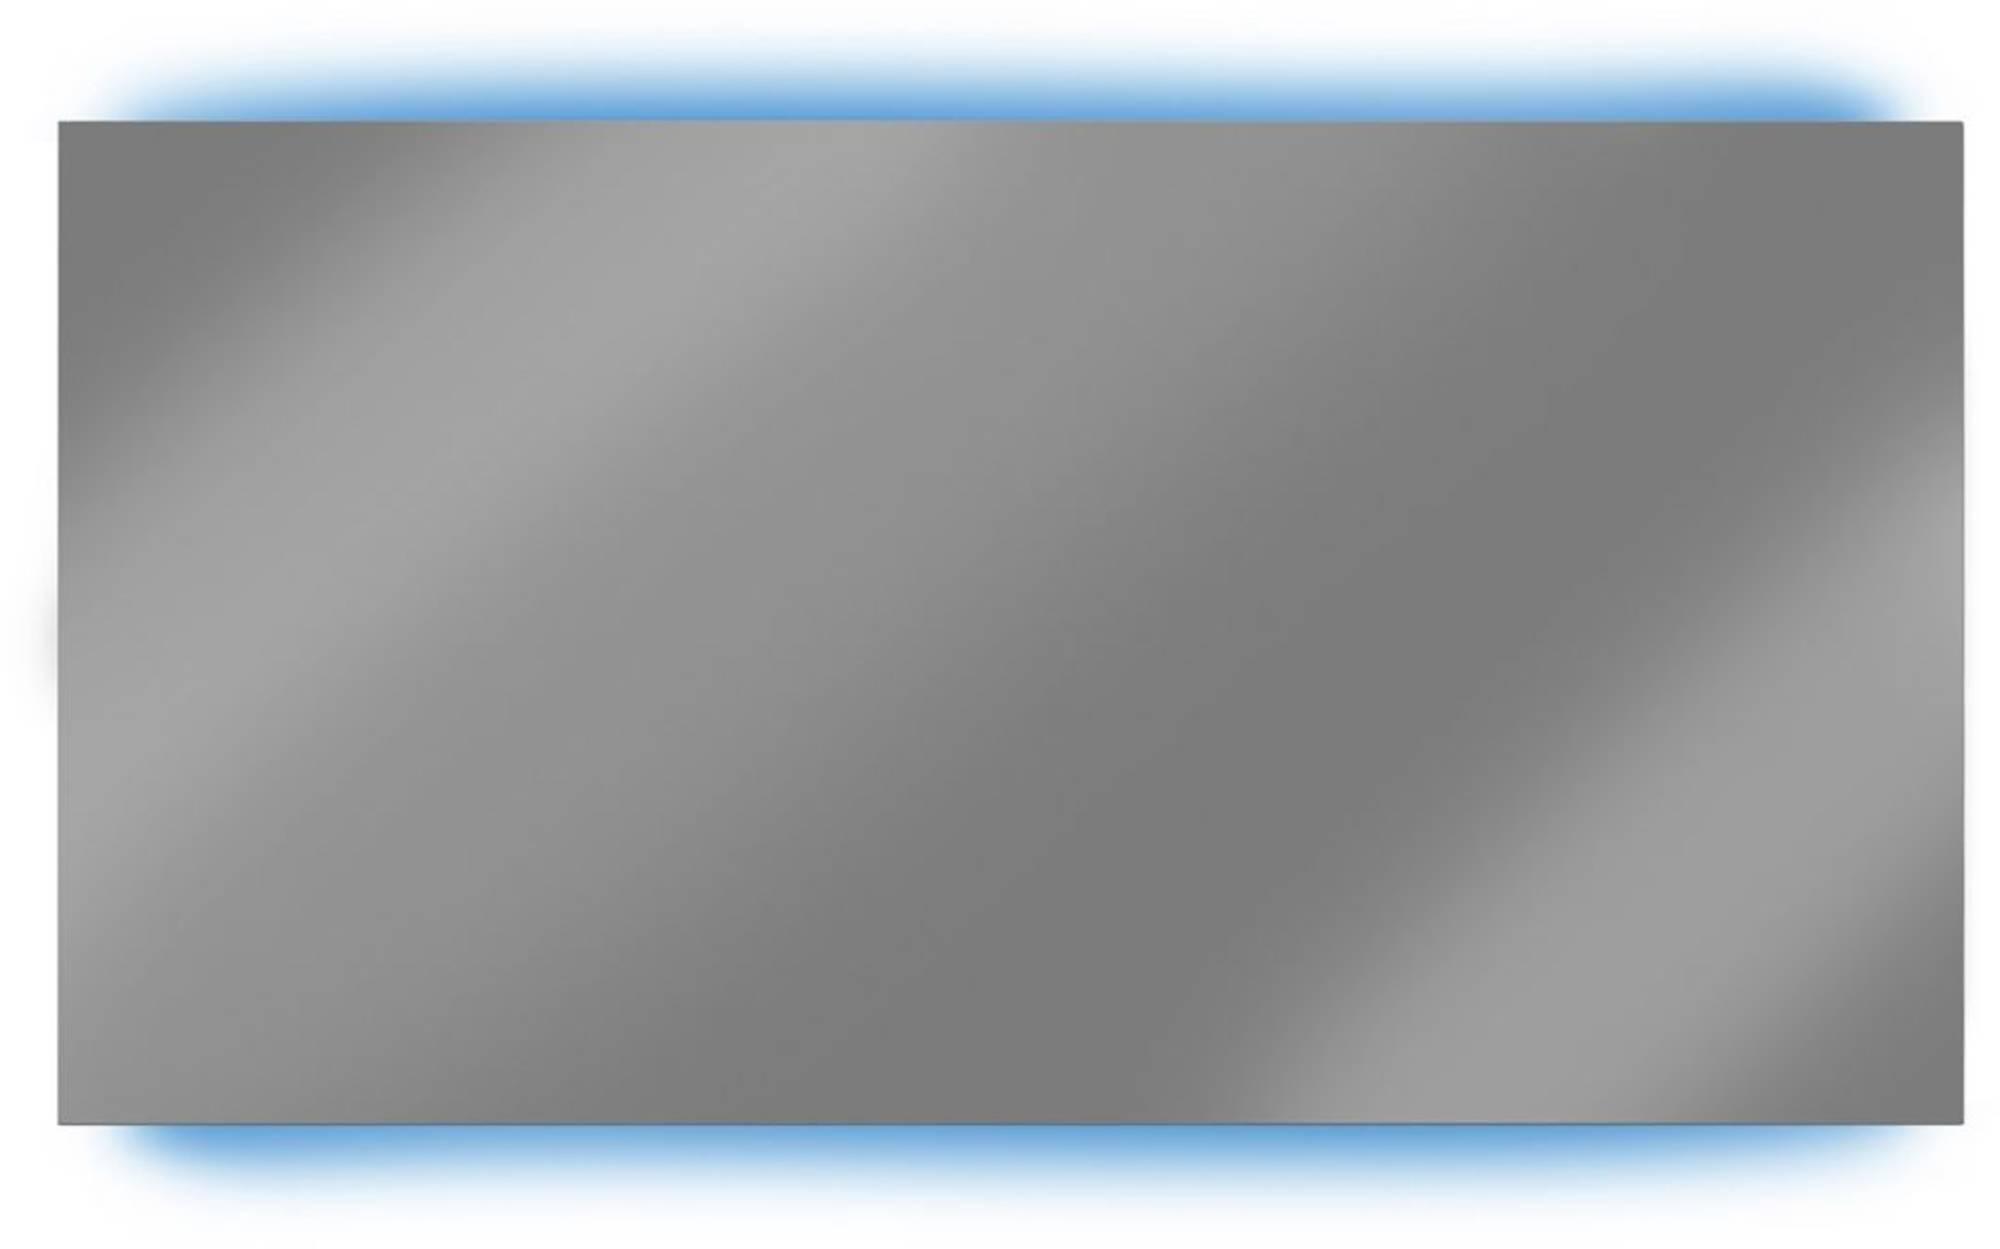 Looox C-line spiegel 100x70 cm. led verlichting boven en onder